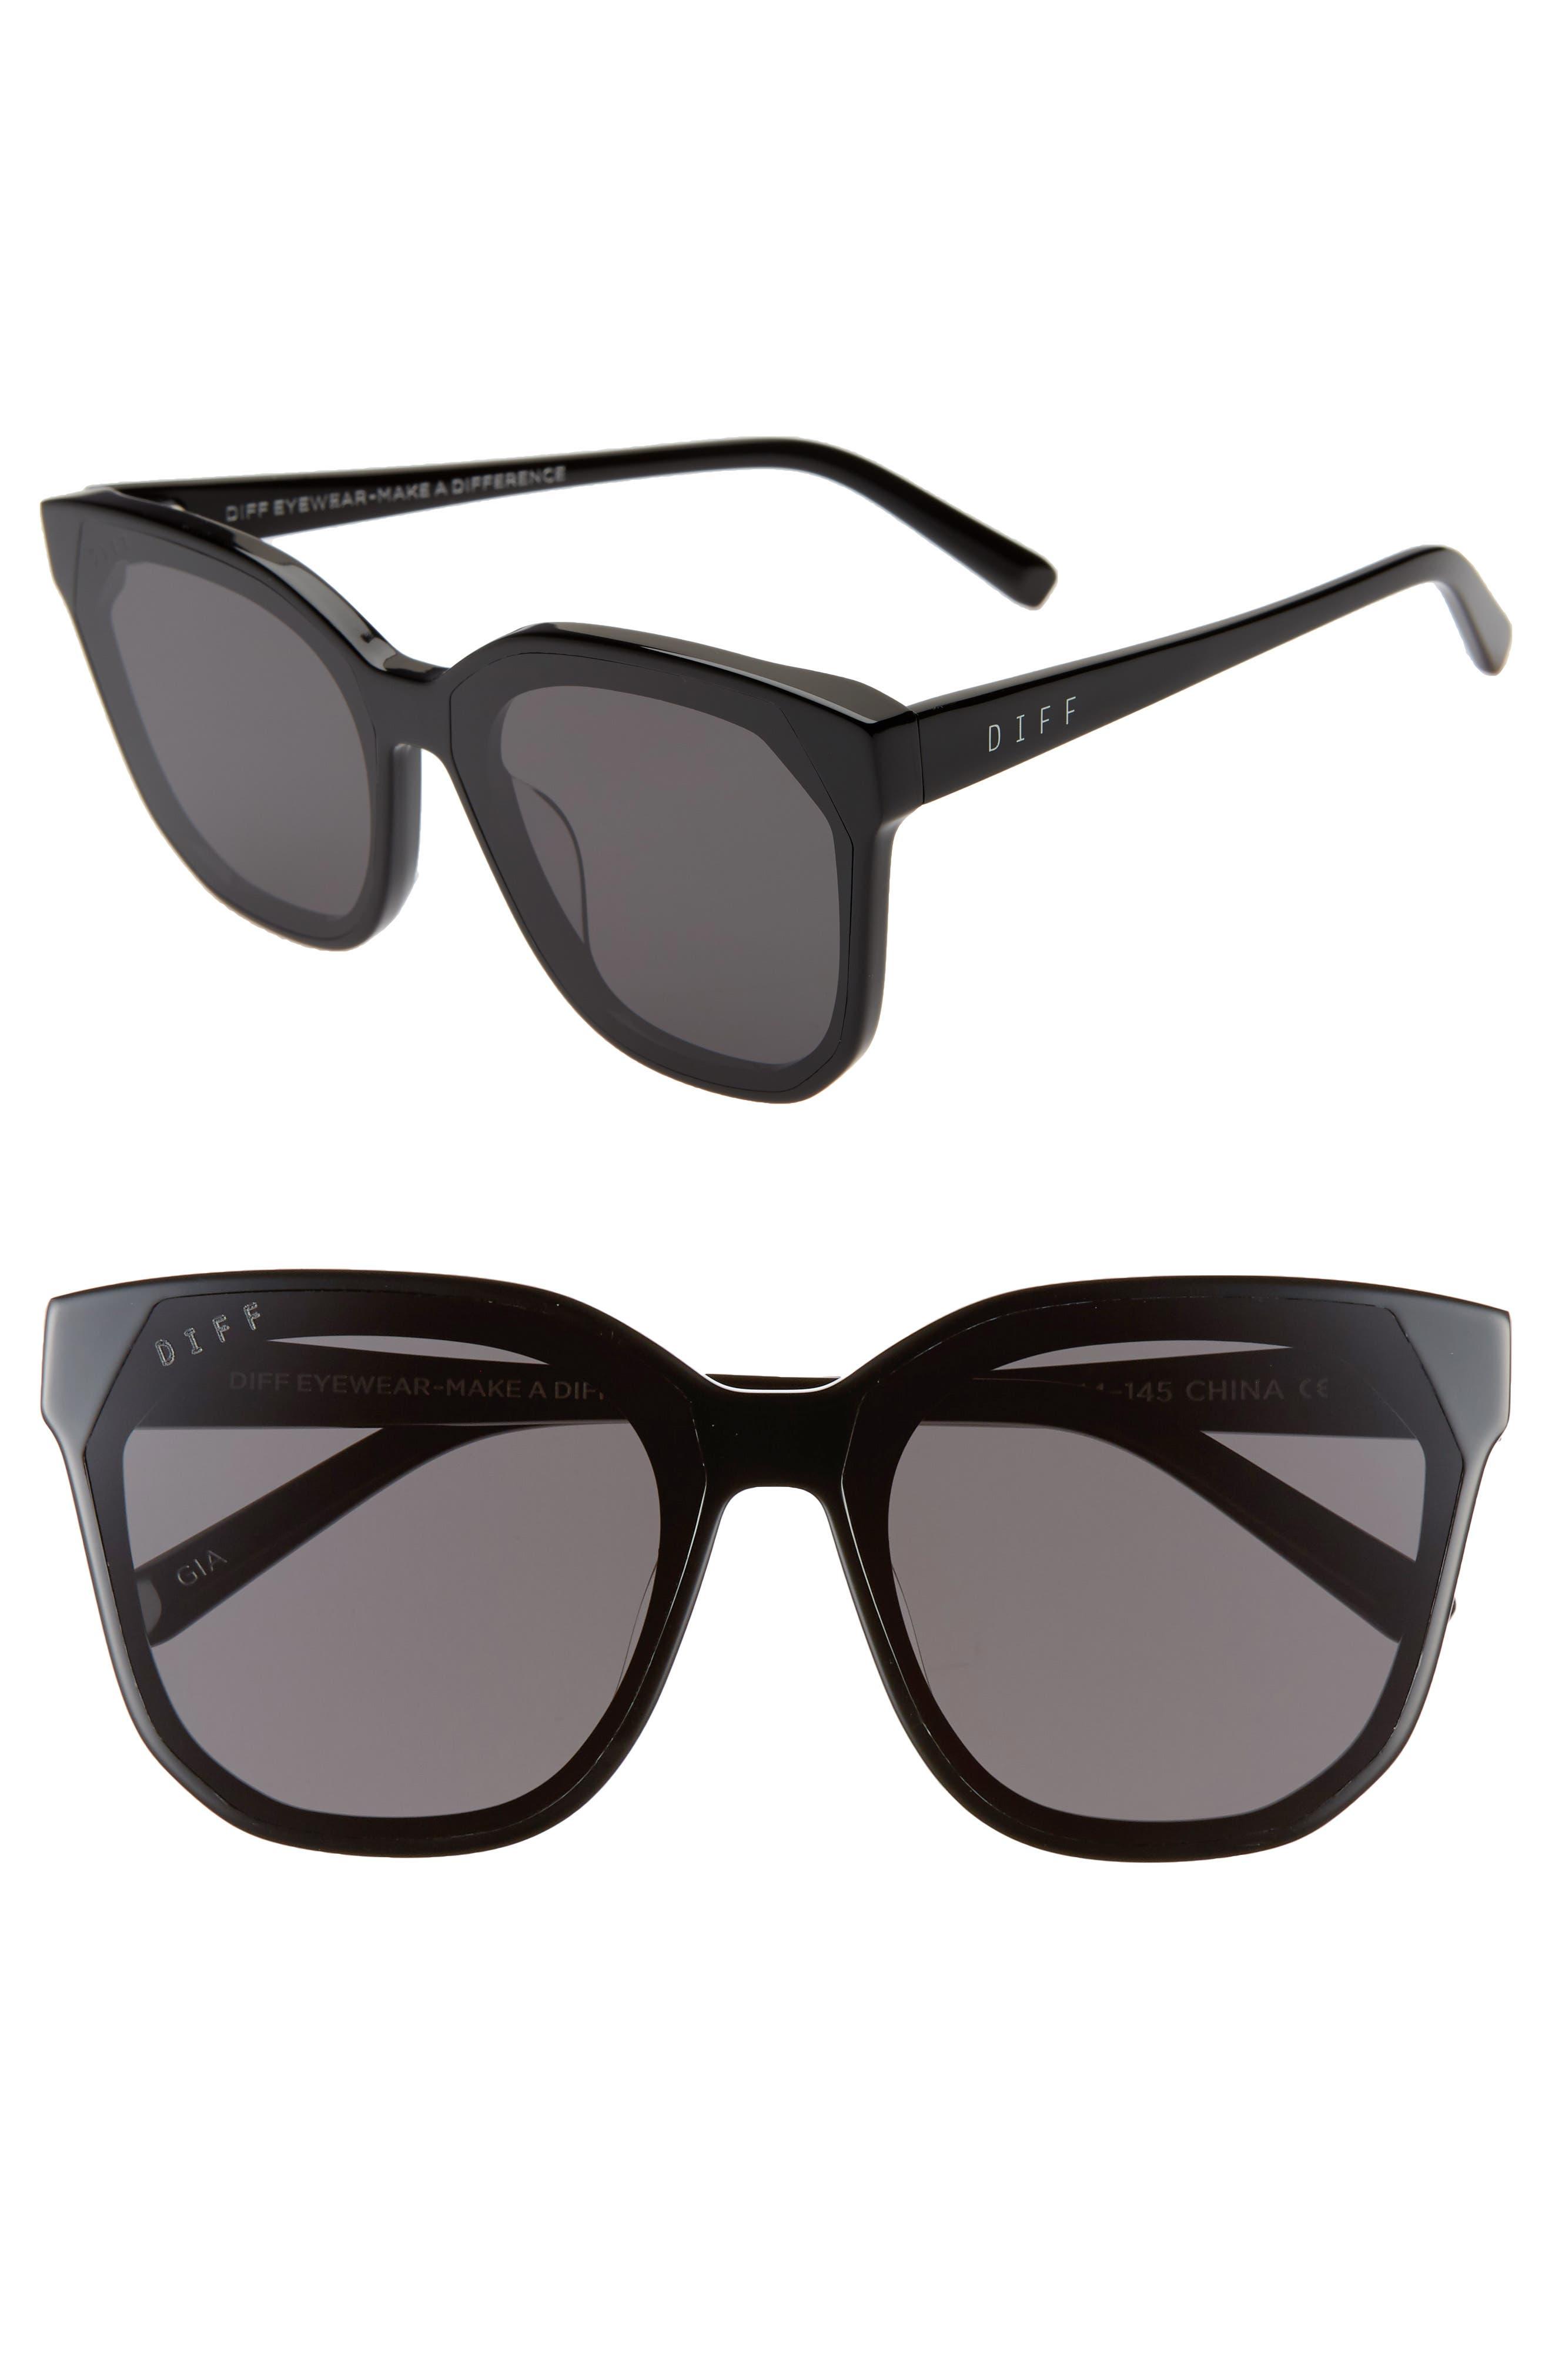 Gia 62mm Oversize Square Sunglasses